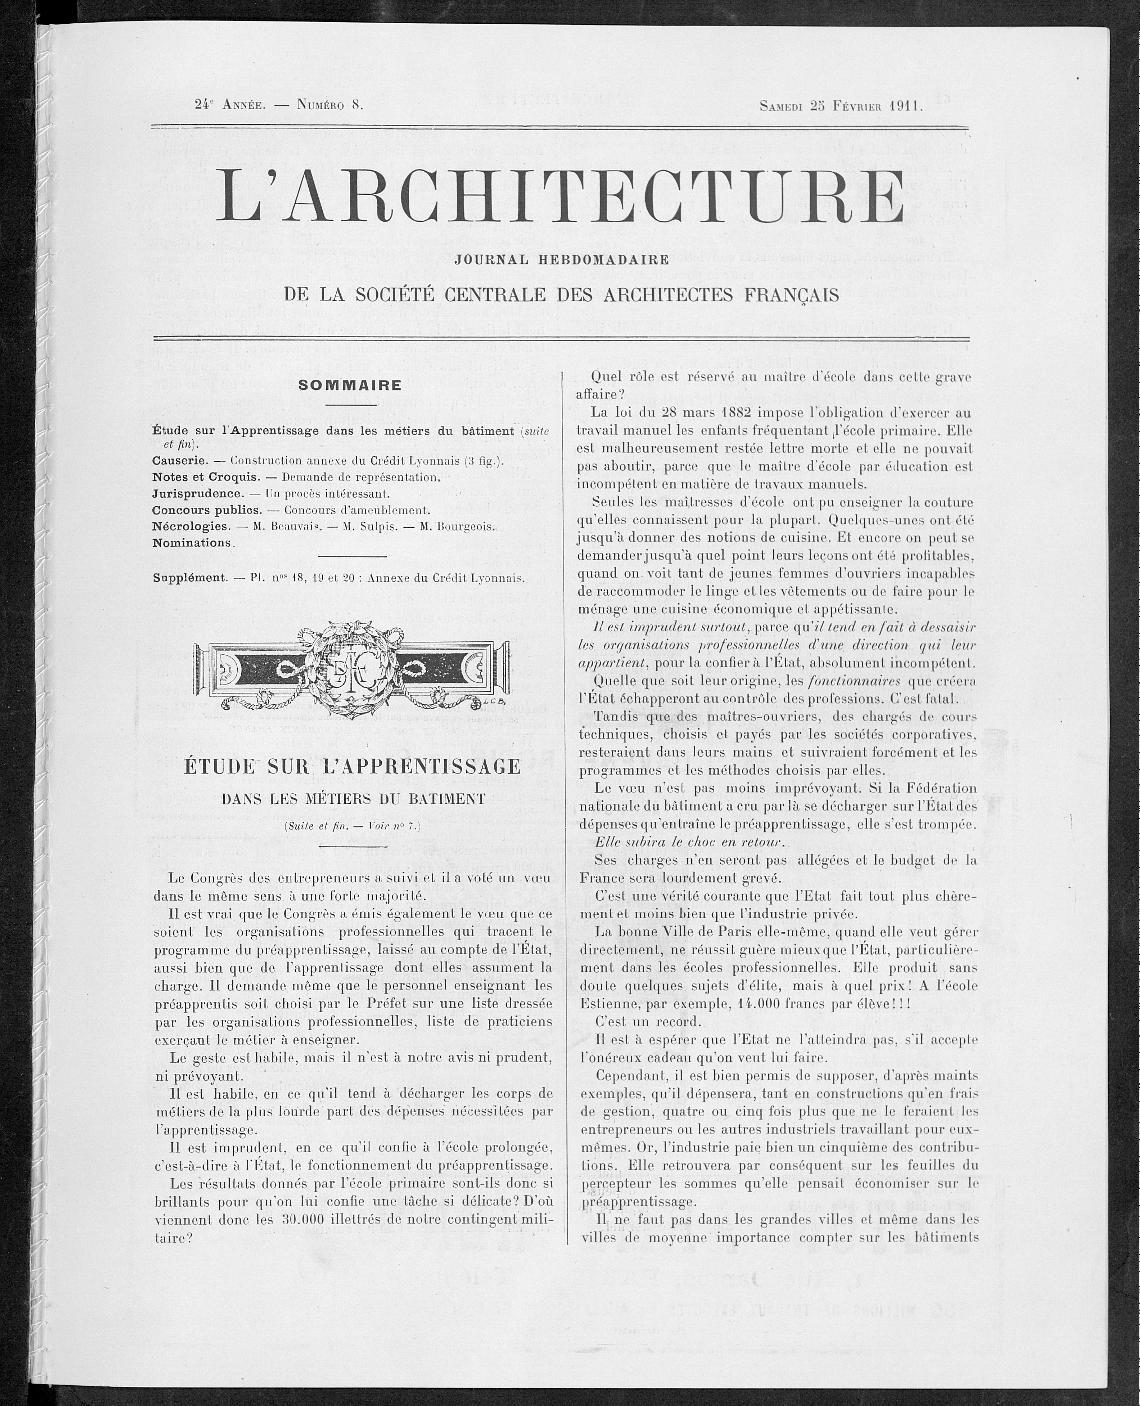 F:\Numerisation\TURE\FRAPN02_TURE_1911_08.pdf  